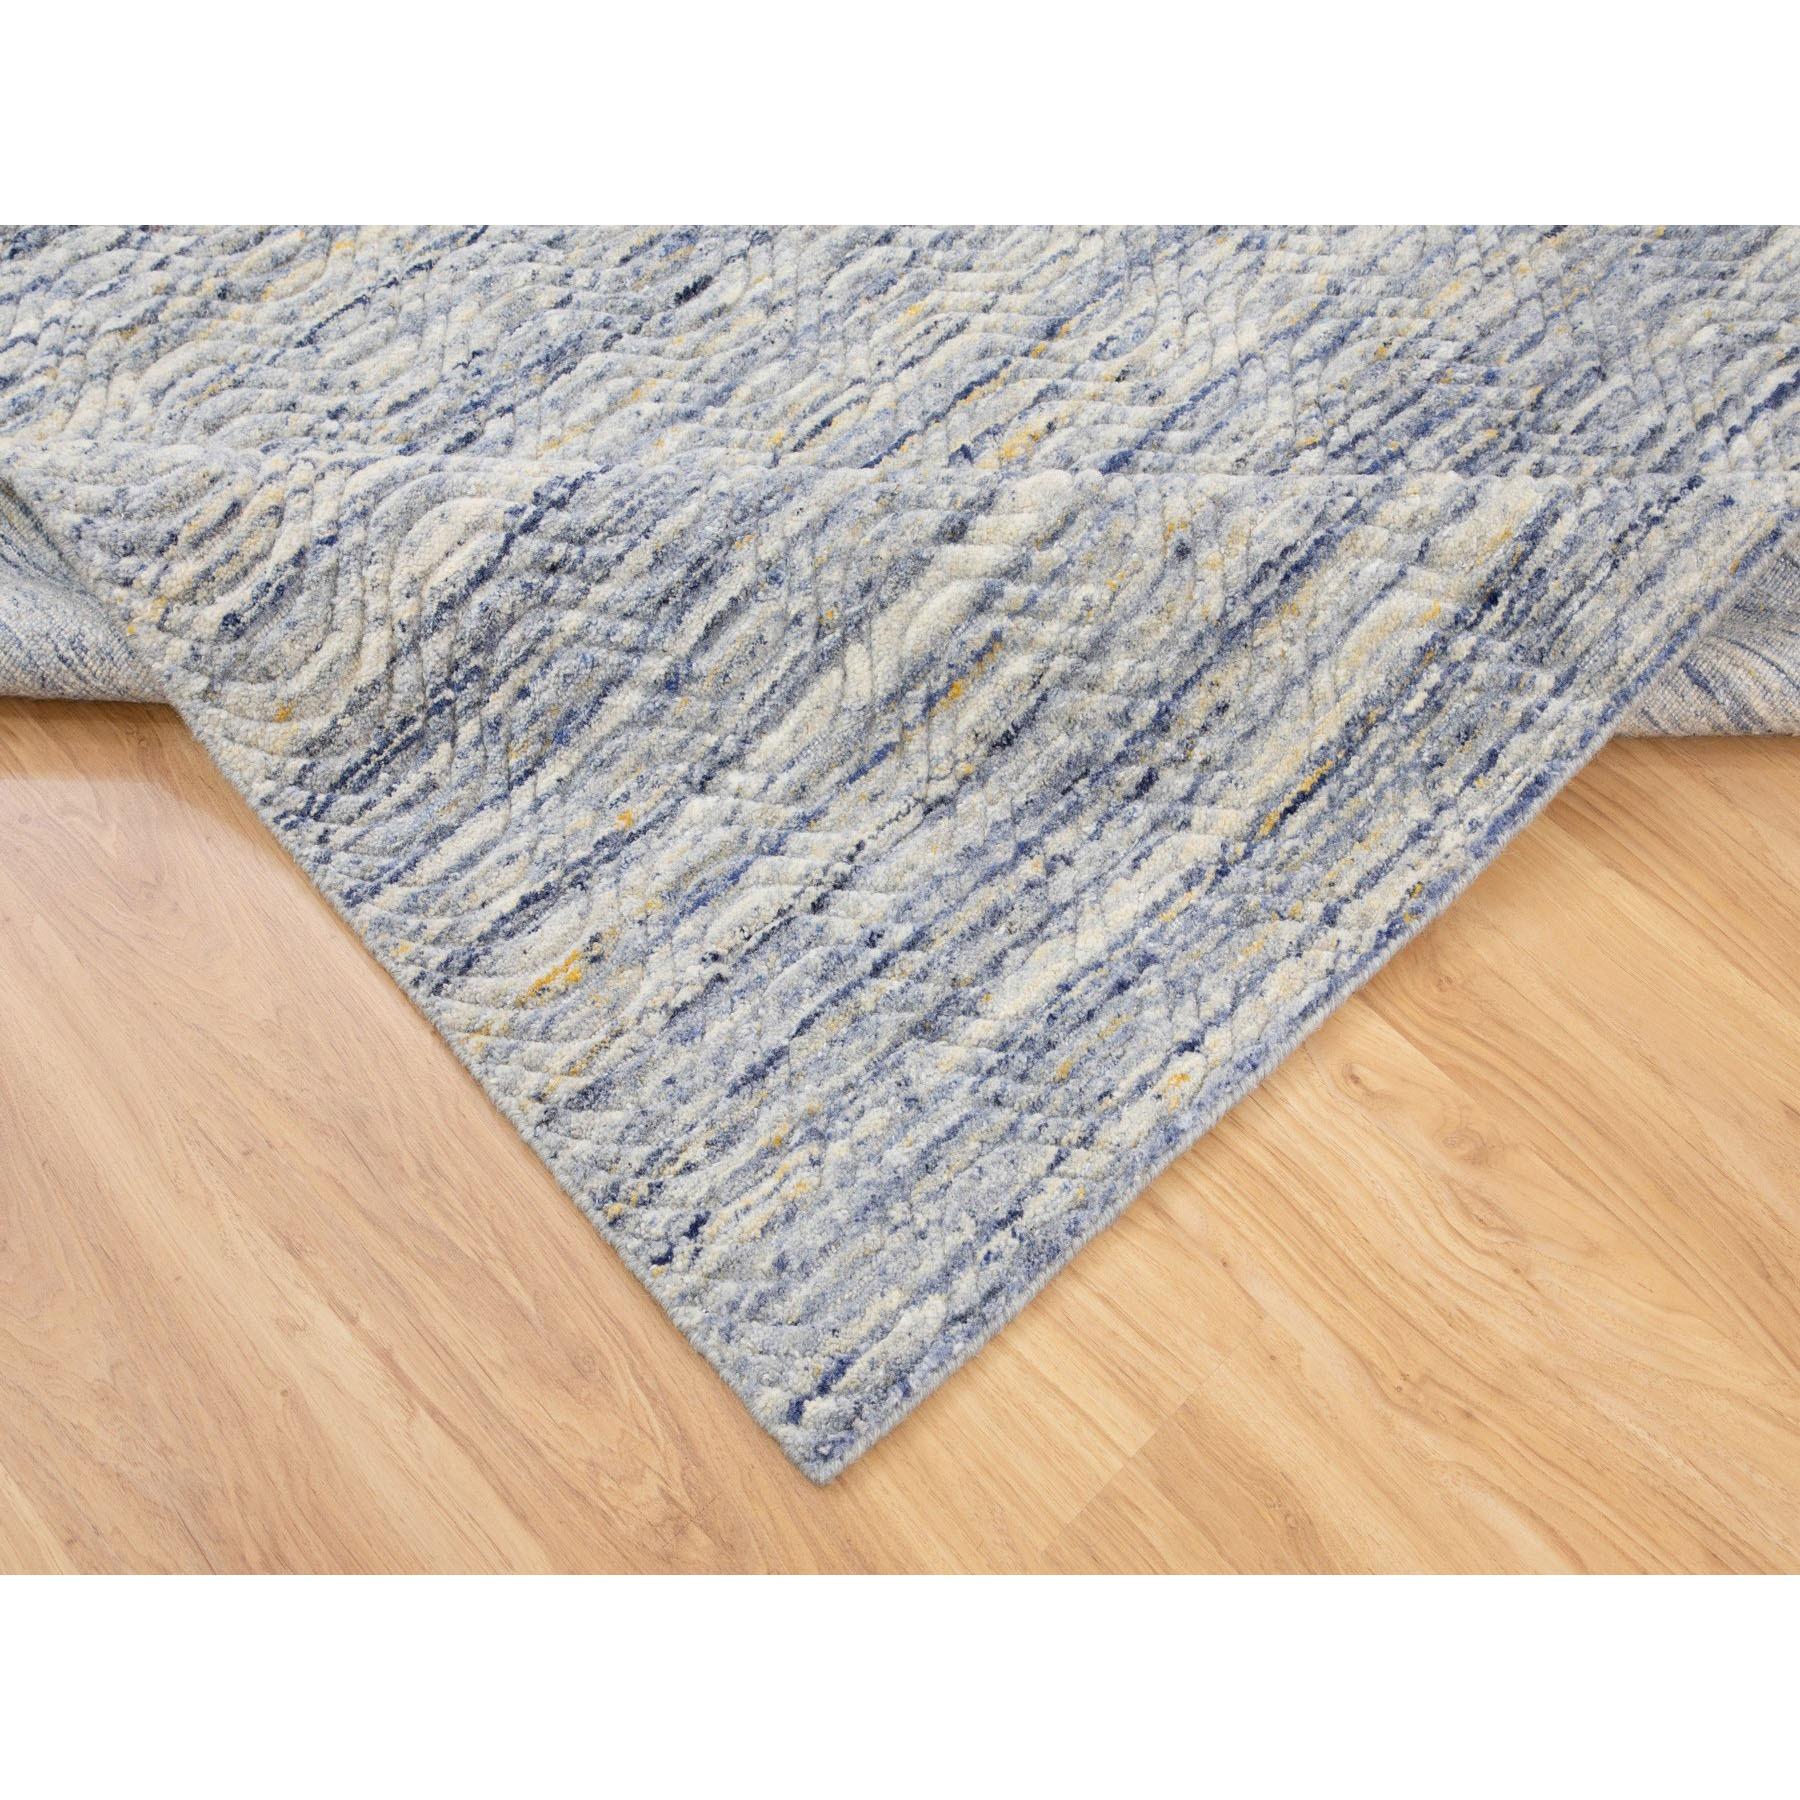 6'x9' Blue Variegated Design Hand Loomed Pure Wool Modern Oriental Rug